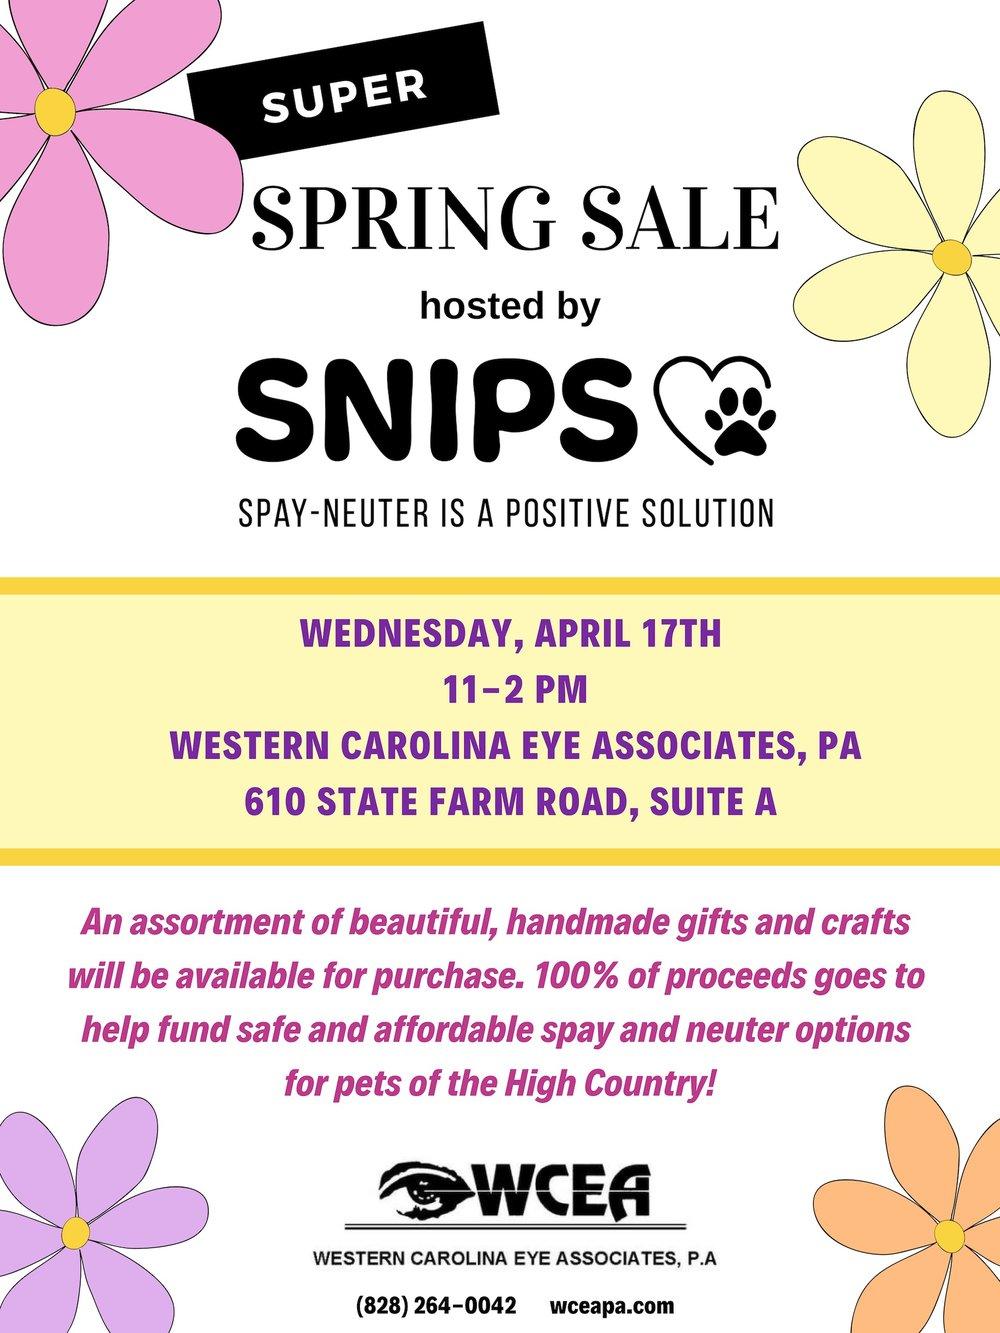 SNIPS Easter Sale Flyer.jpg